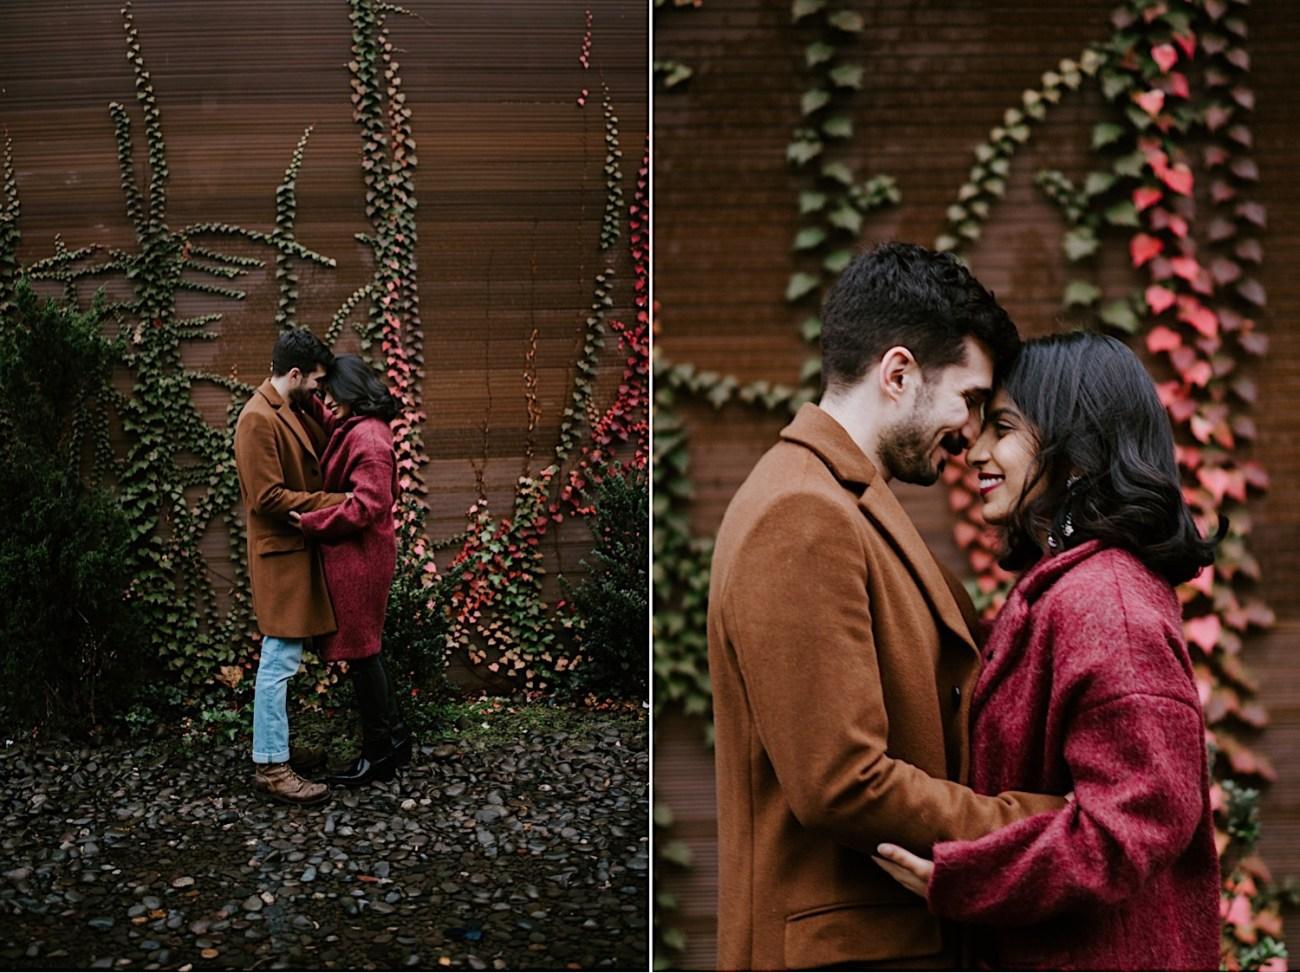 Brooklyn Wedding Photographer New York Wedding Photographer Anais Possamai Photographer 18